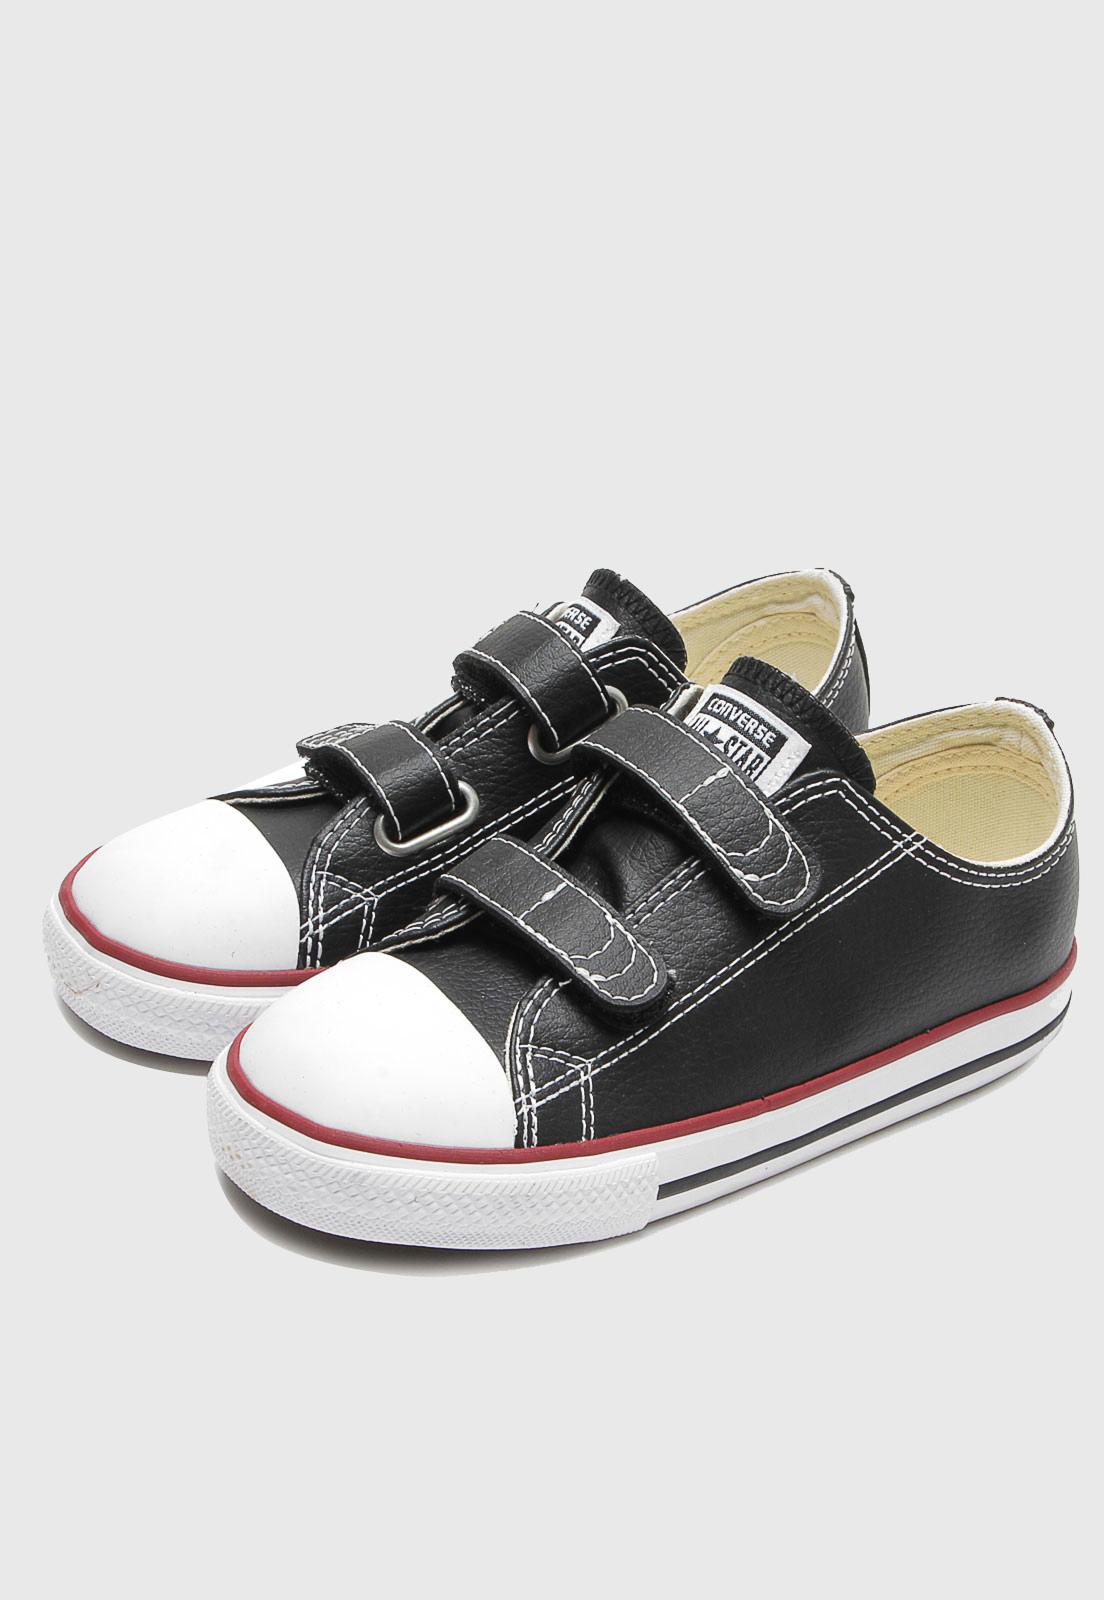 Tênis Converse Couro All Star 2v Kids Preto Ck04180003